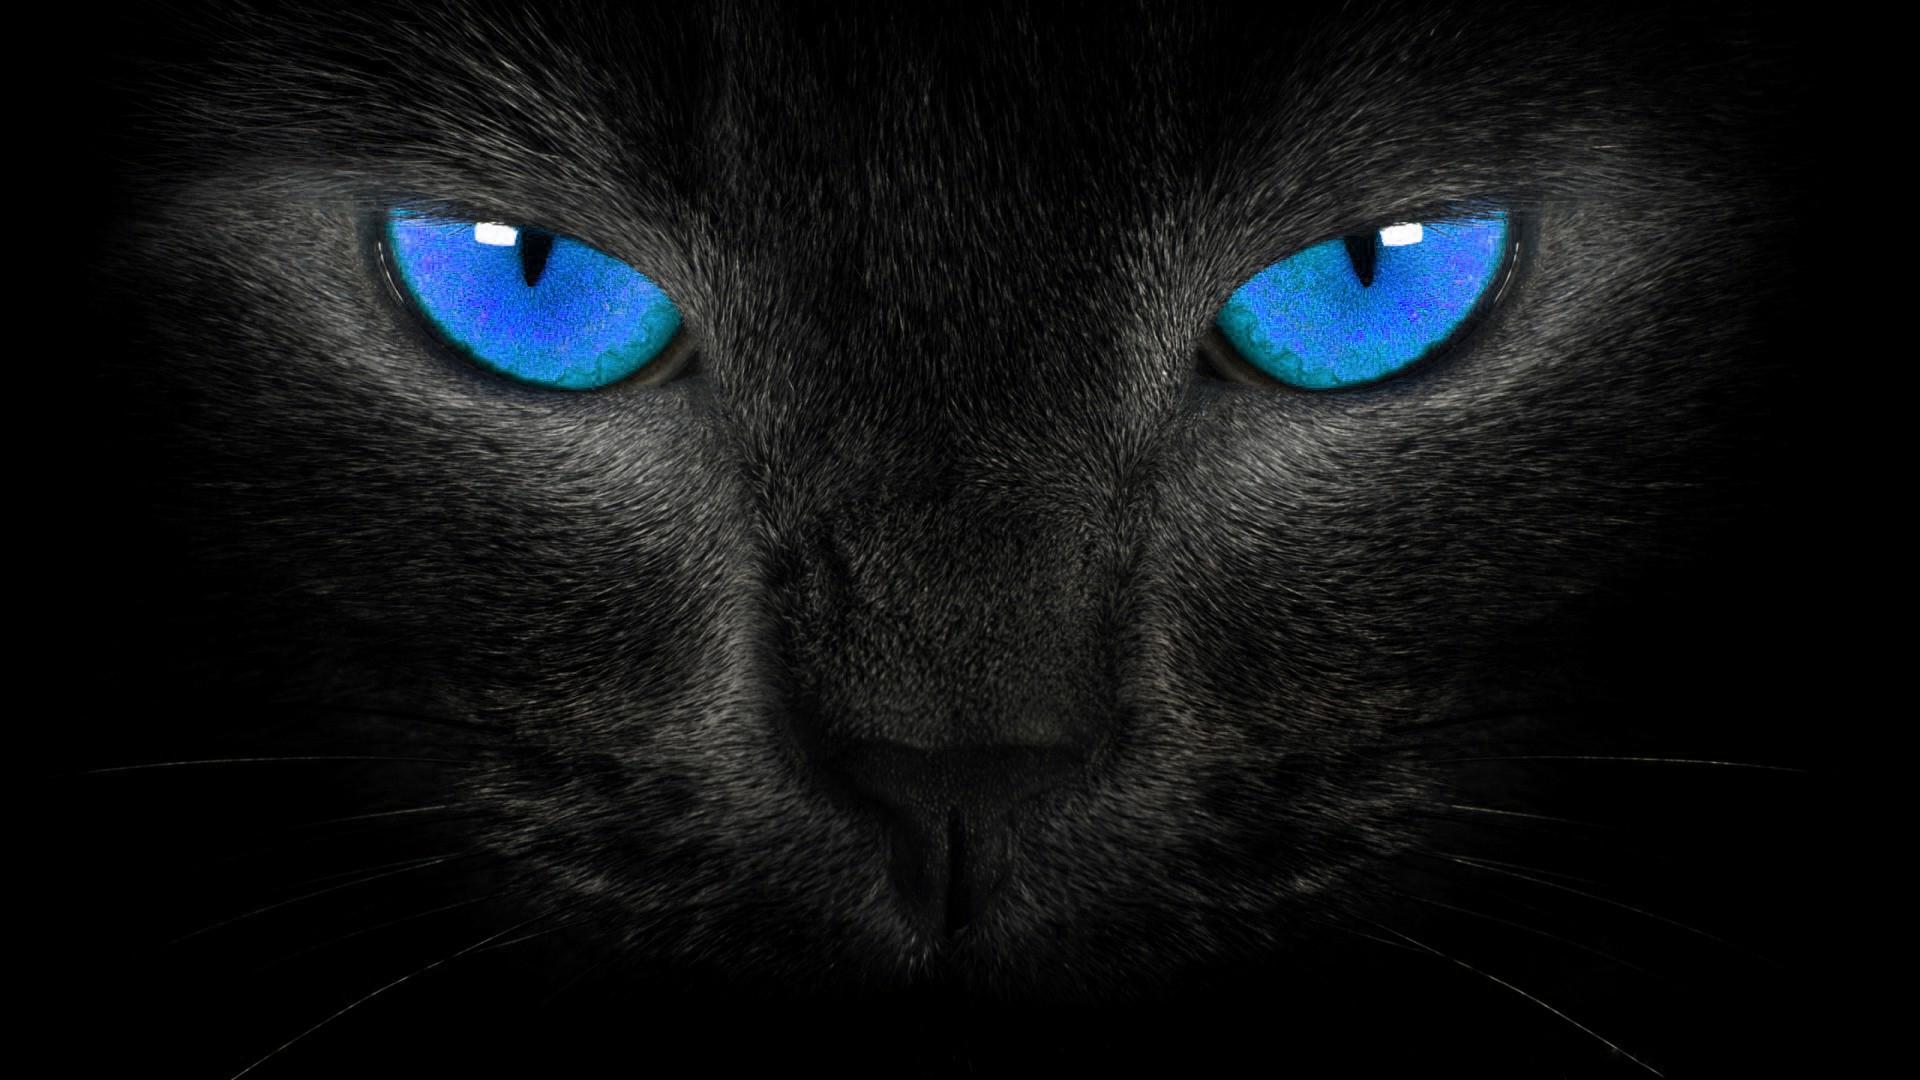 image - hd-wallpapers-blackblue-wallpaper-black-cat-blue-eyes